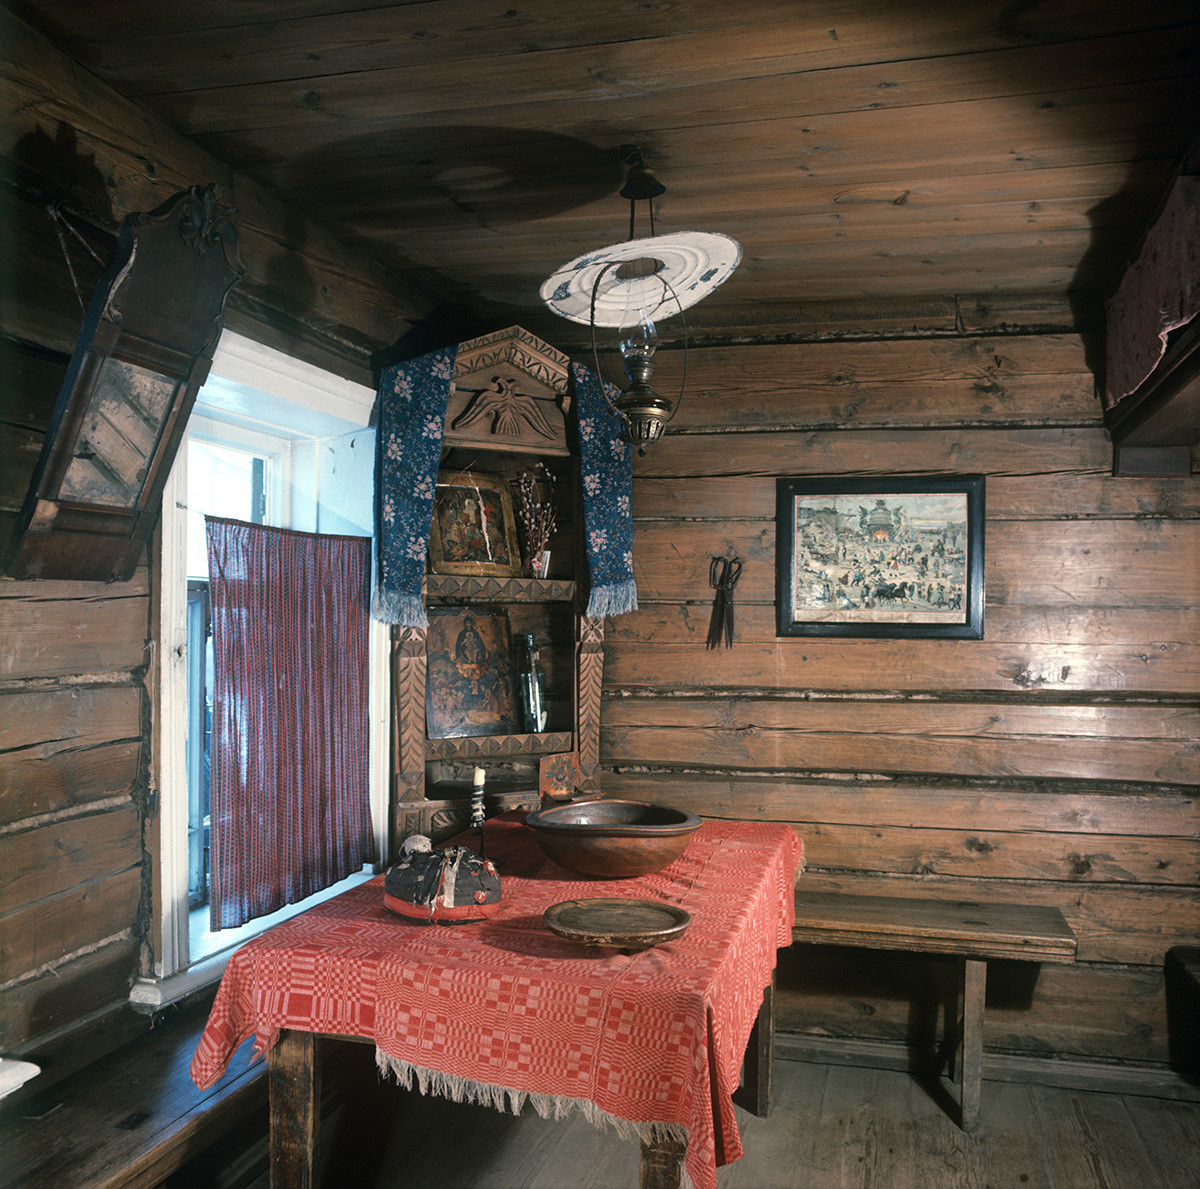 Un'antica cucina russa